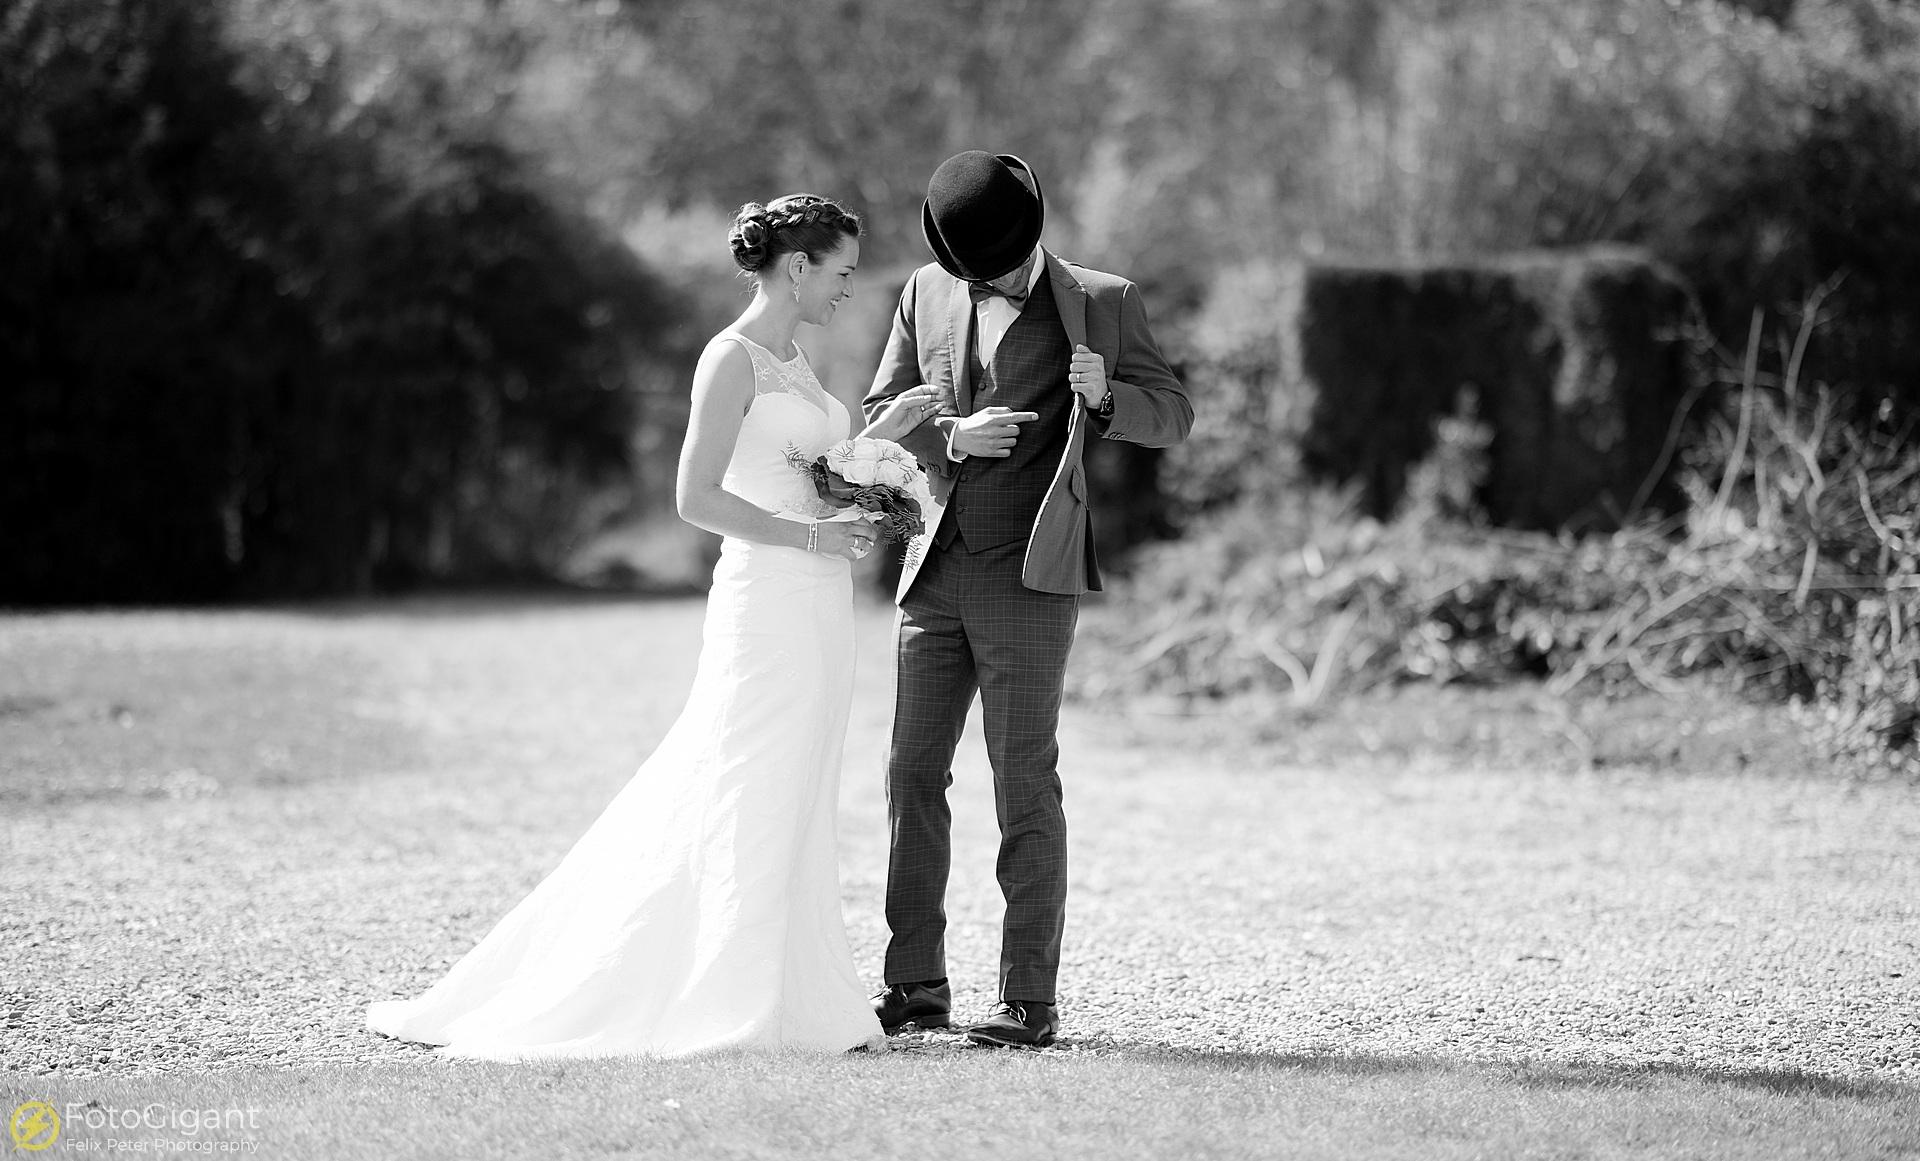 Hochzeitsfotografiekurs_Fotograf_Felix_Peter_15.jpg